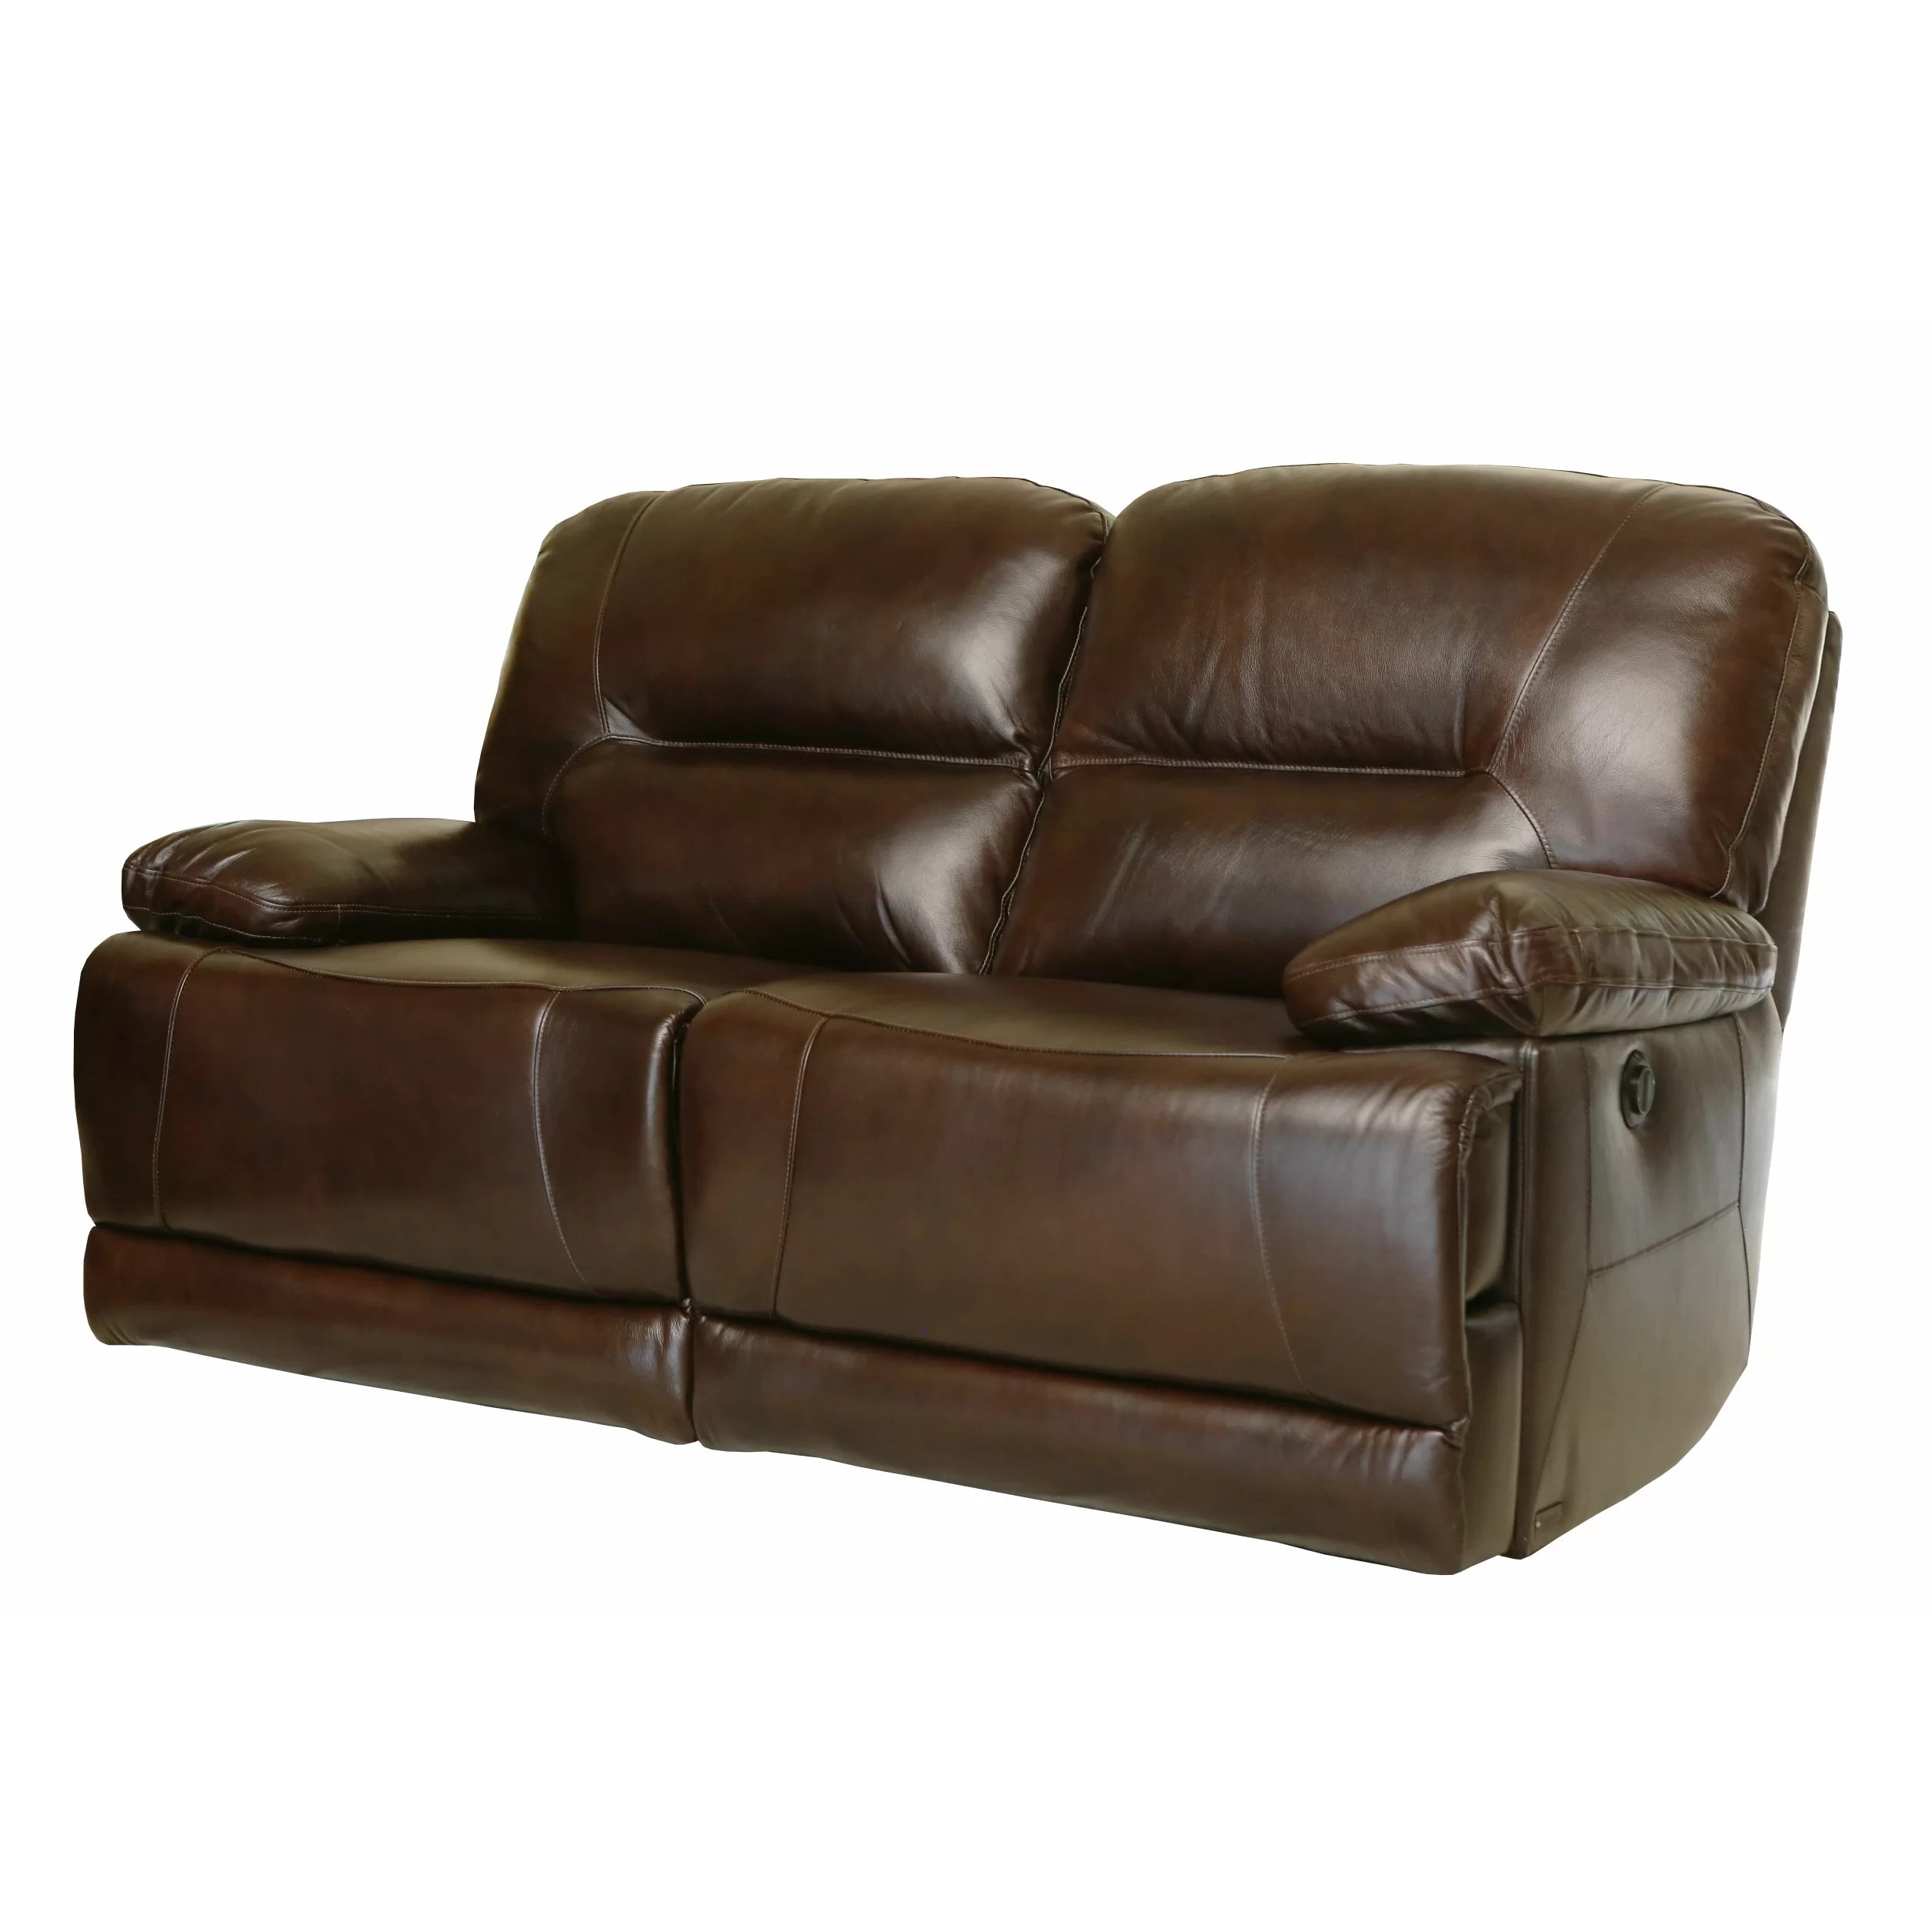 abbyson leather sofa leonardo large recliner black living brownstone power reclining loveseat